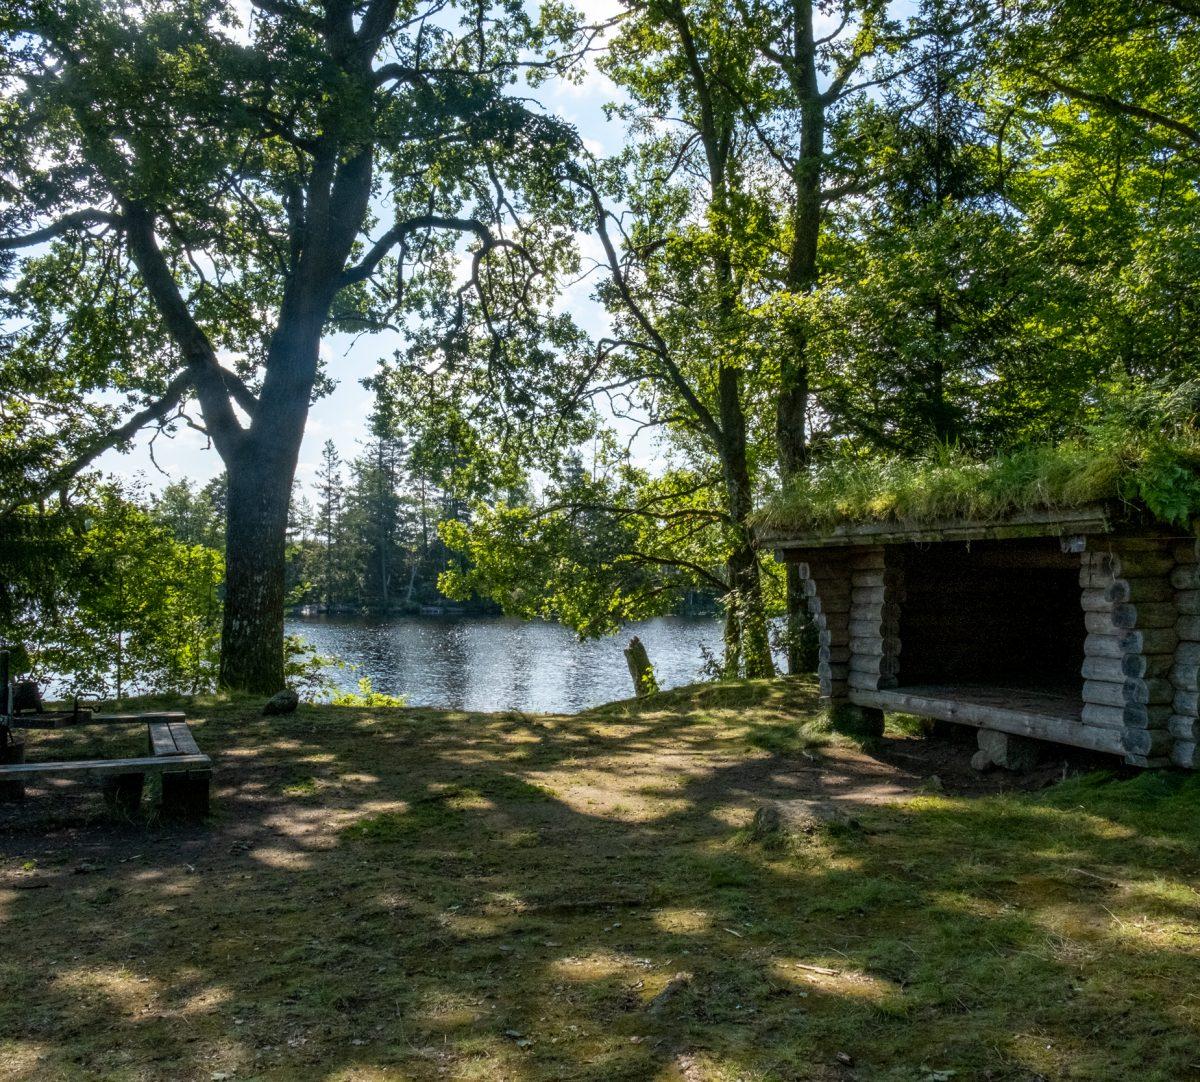 vindskydd med en eldstad en bit ifrån, vid en sjö. Foto.